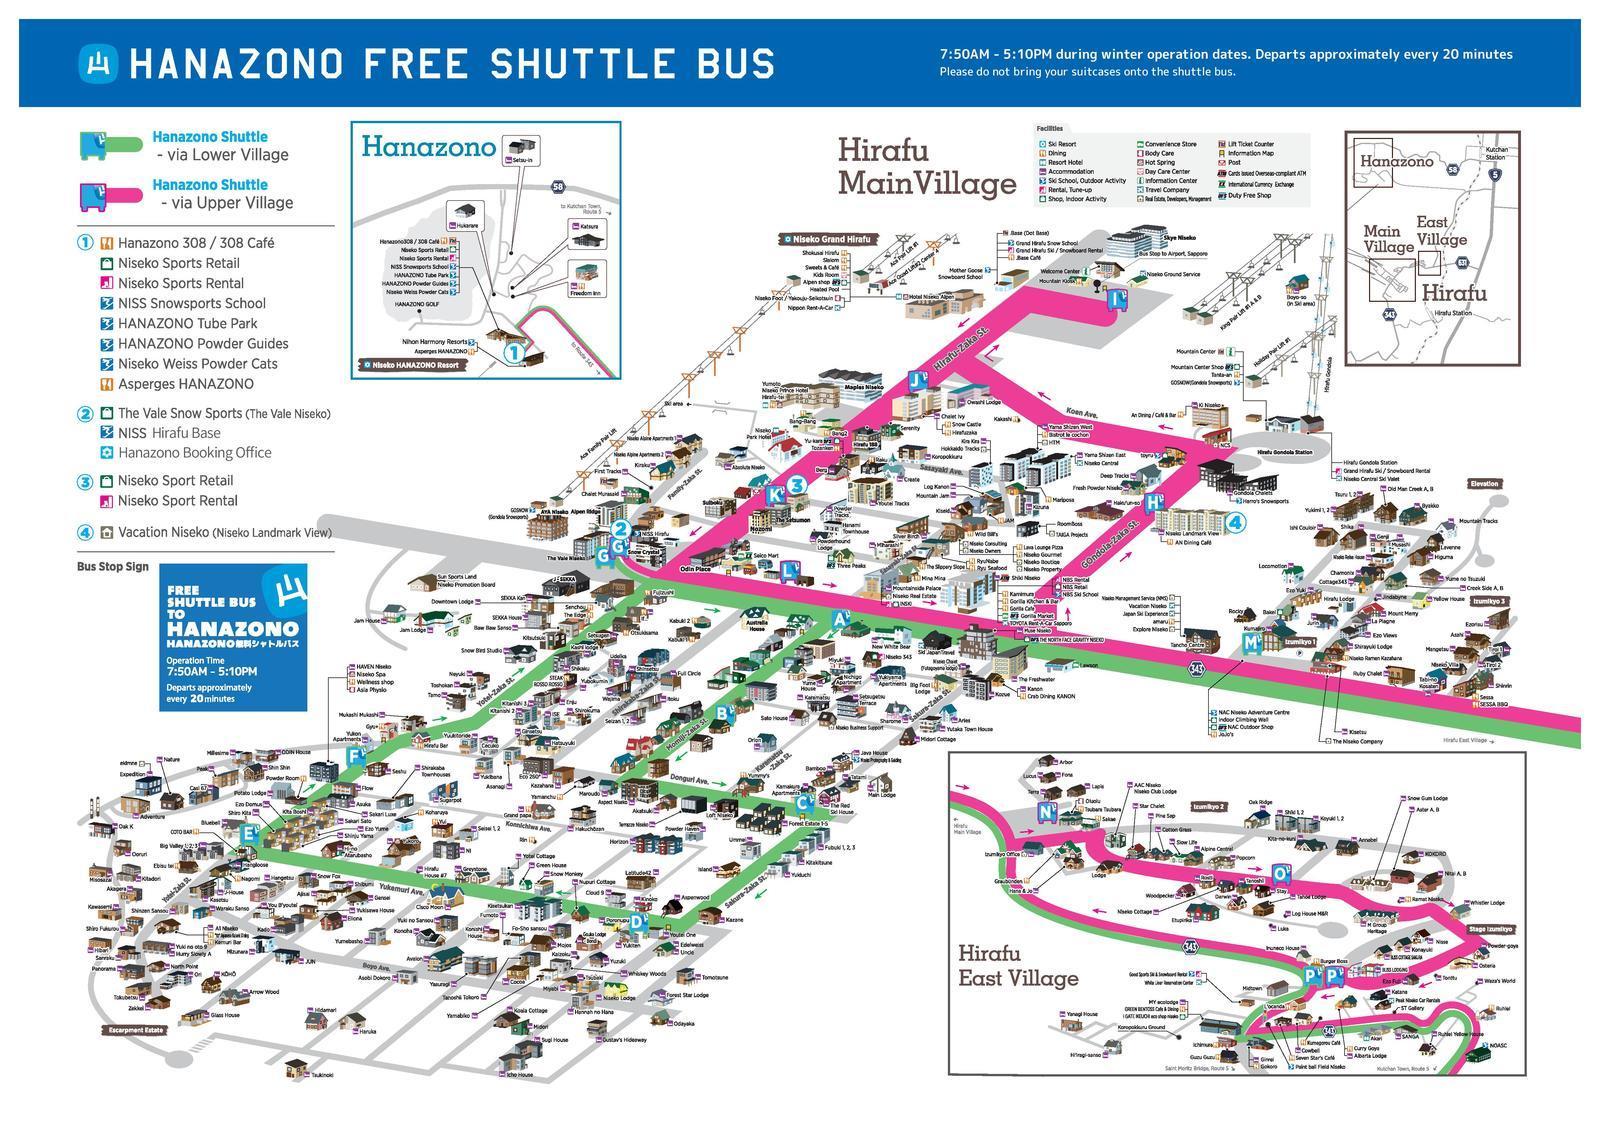 hanazono bus schedule